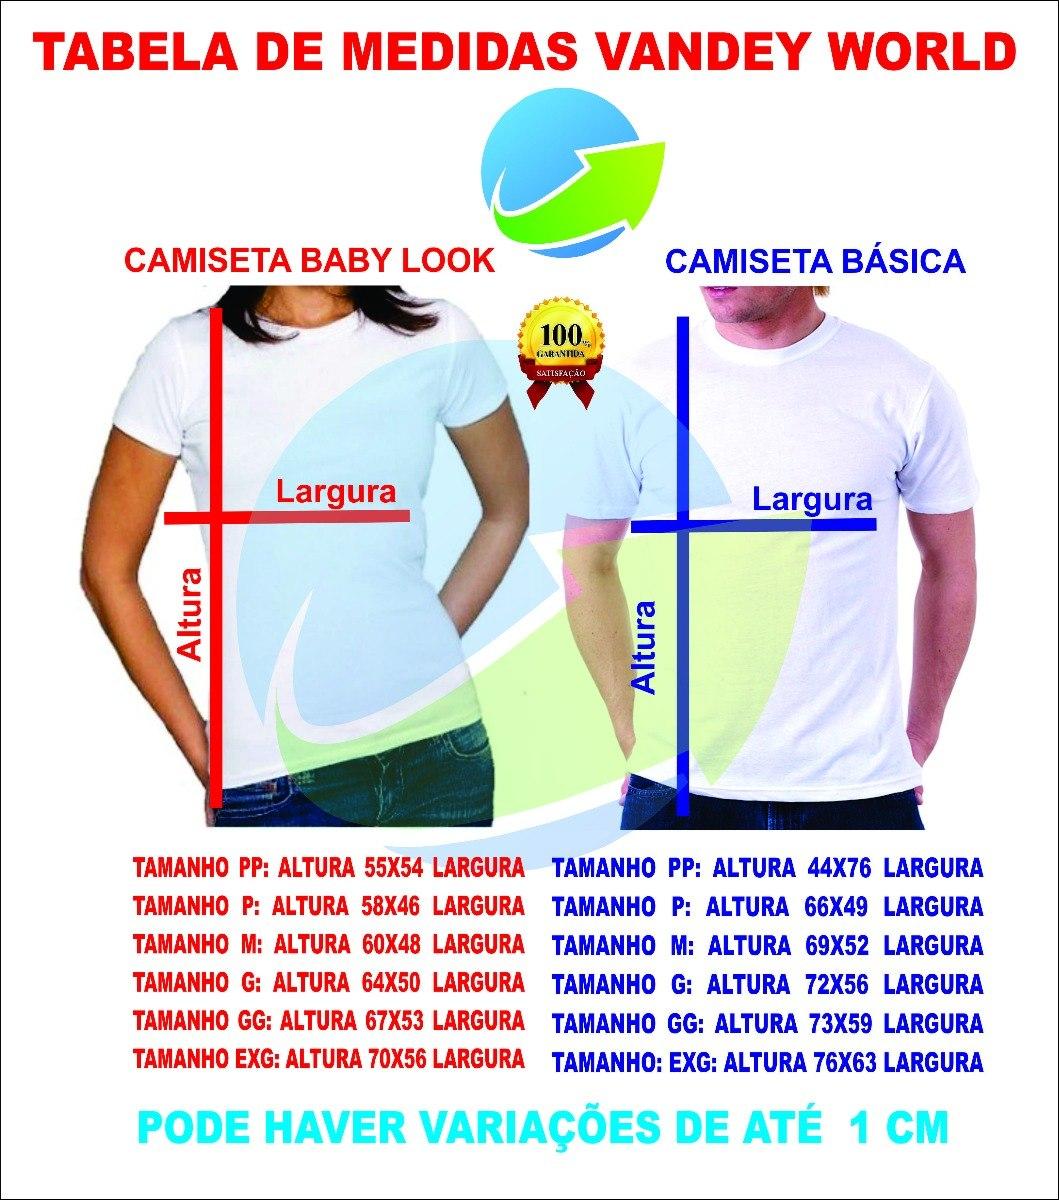 798eb294b4325 camiseta colorida lisa básica malha100%poliester camisa. Carregando zoom.